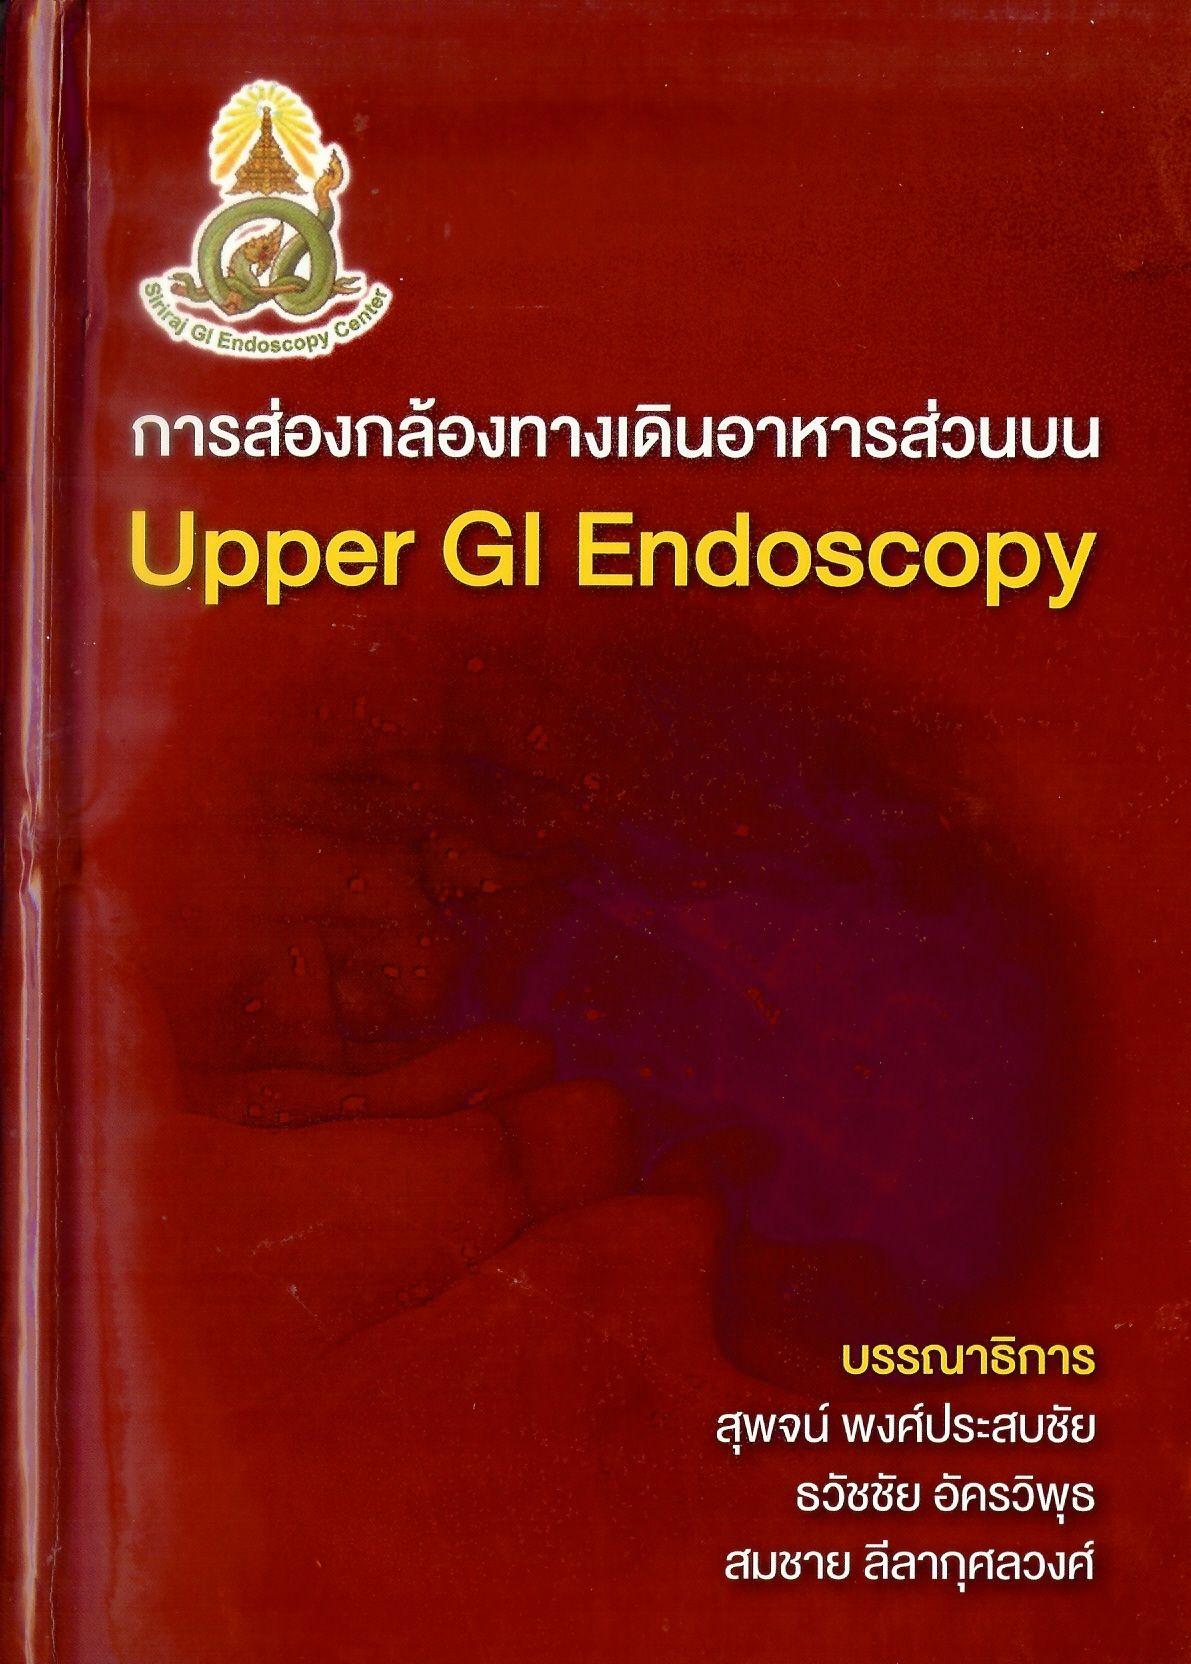 Upper Gi Endoscopy